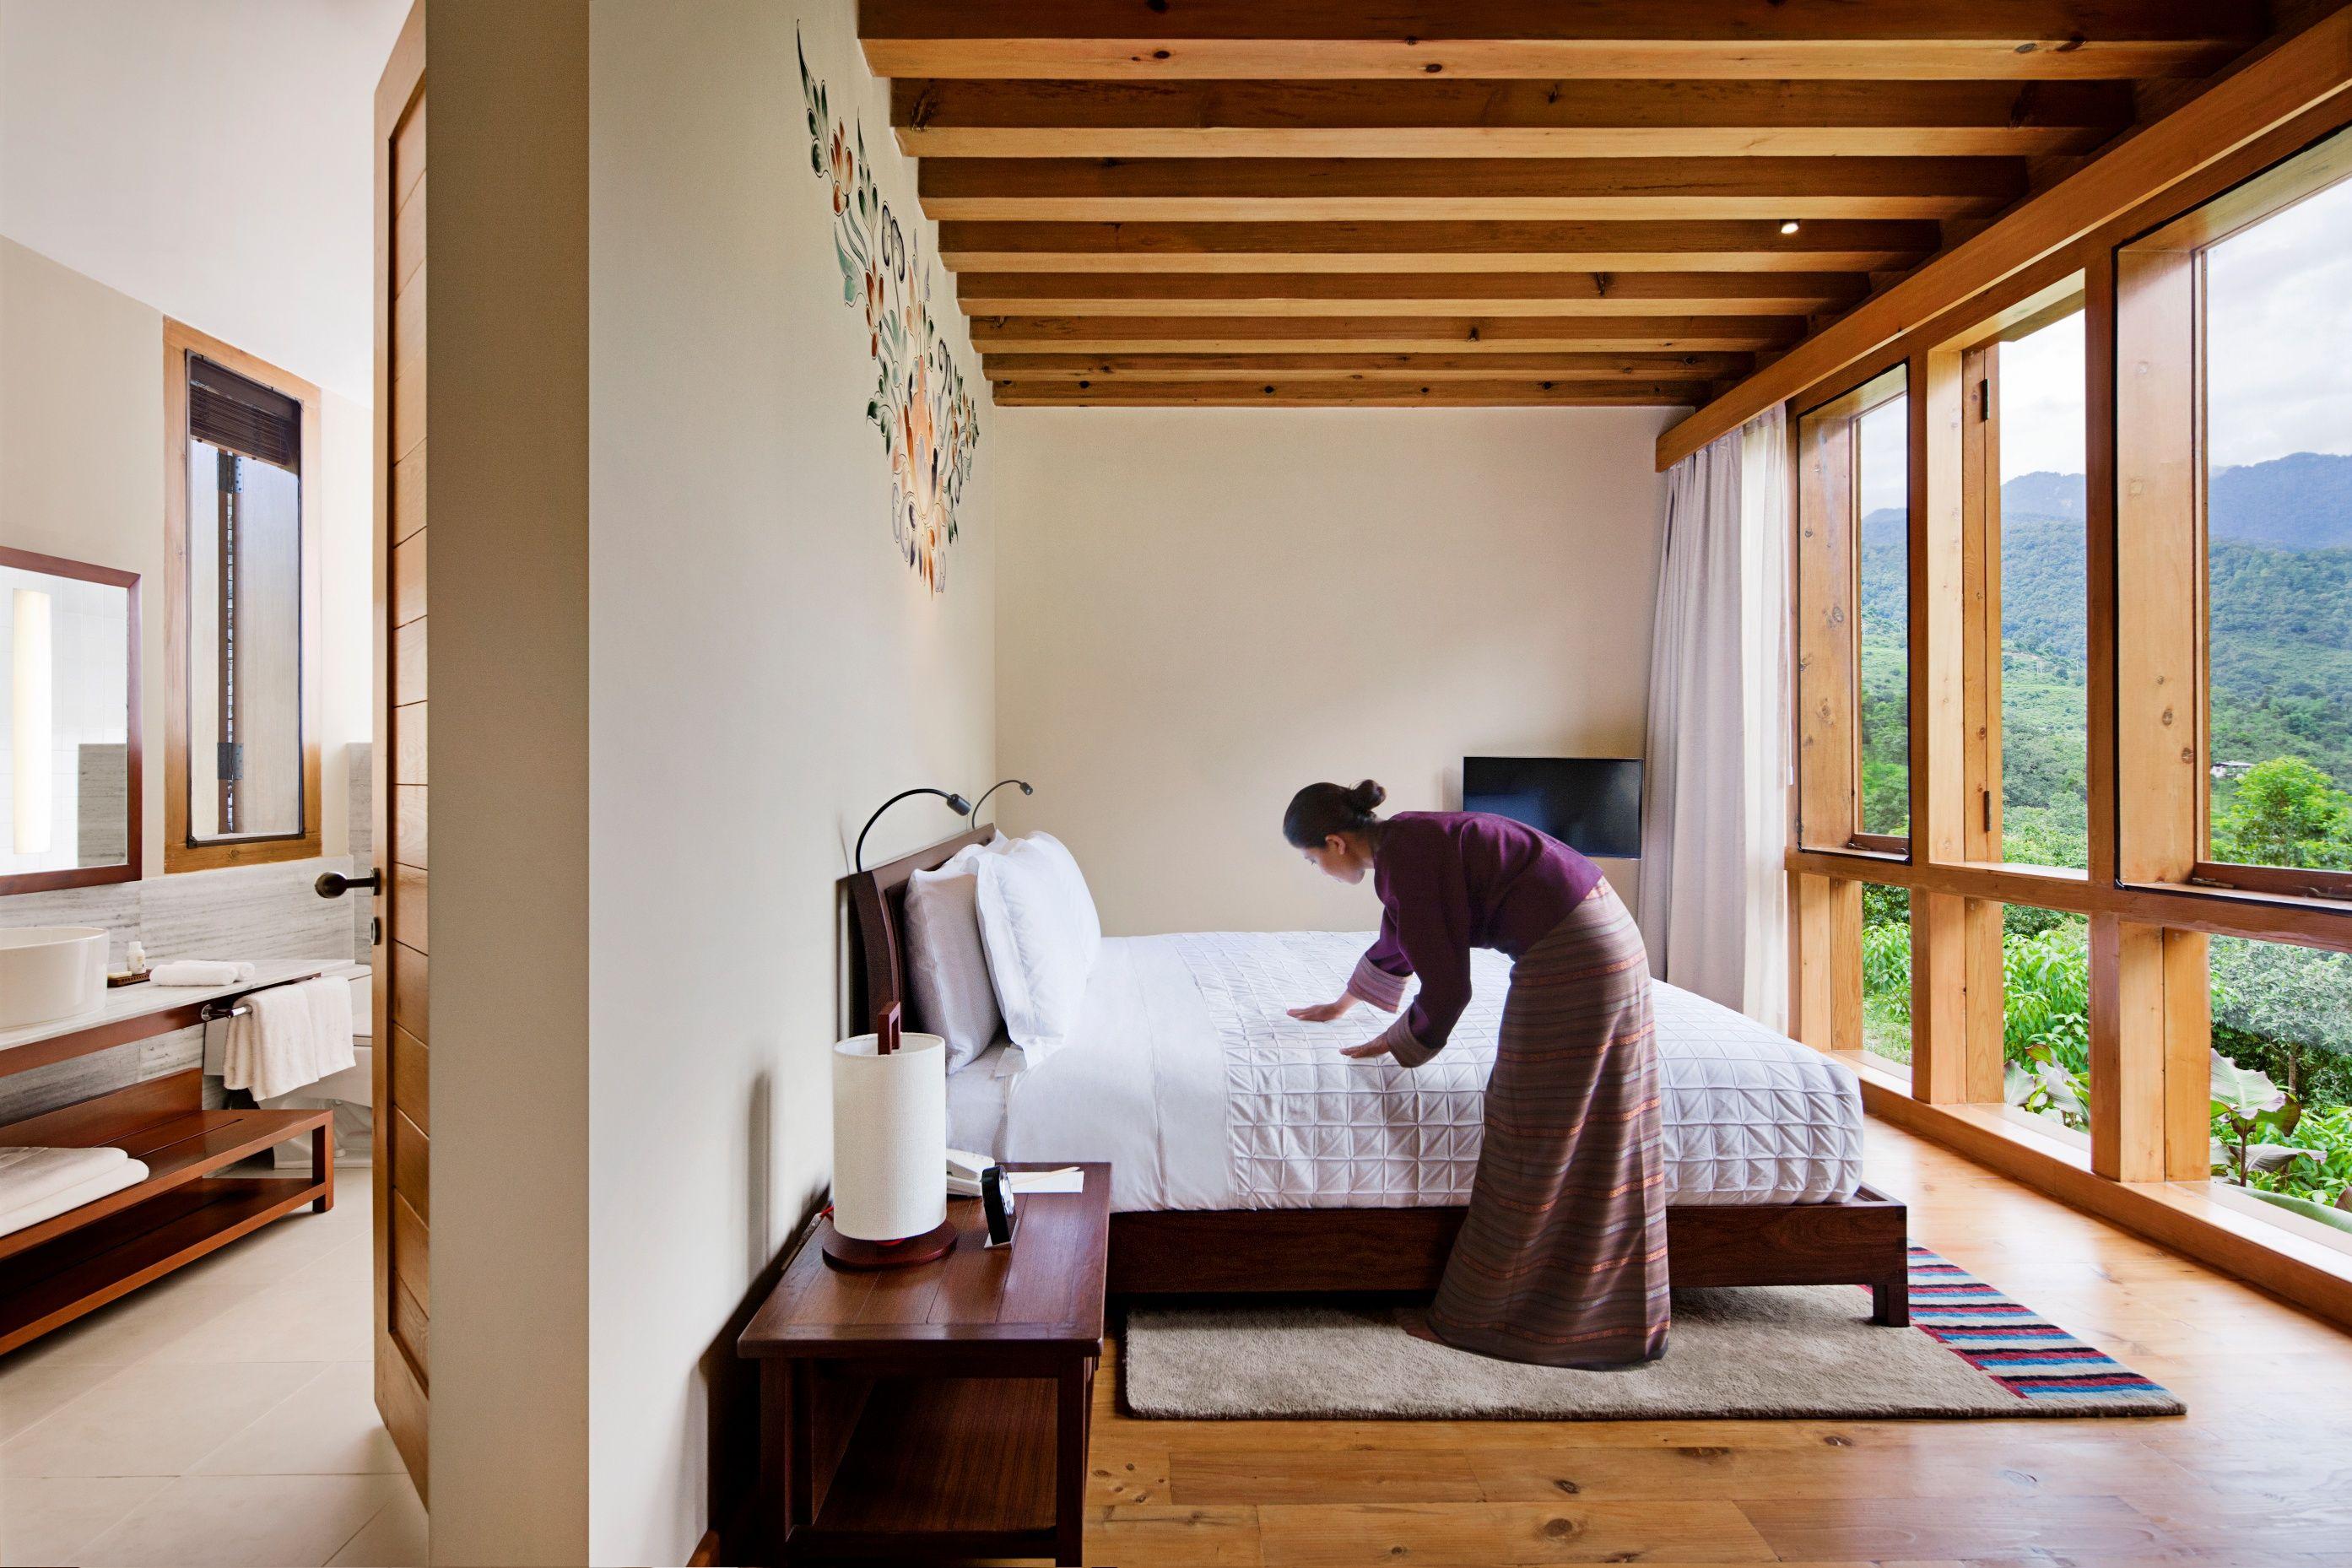 Bedroom At Uma Punakha, Bhutan